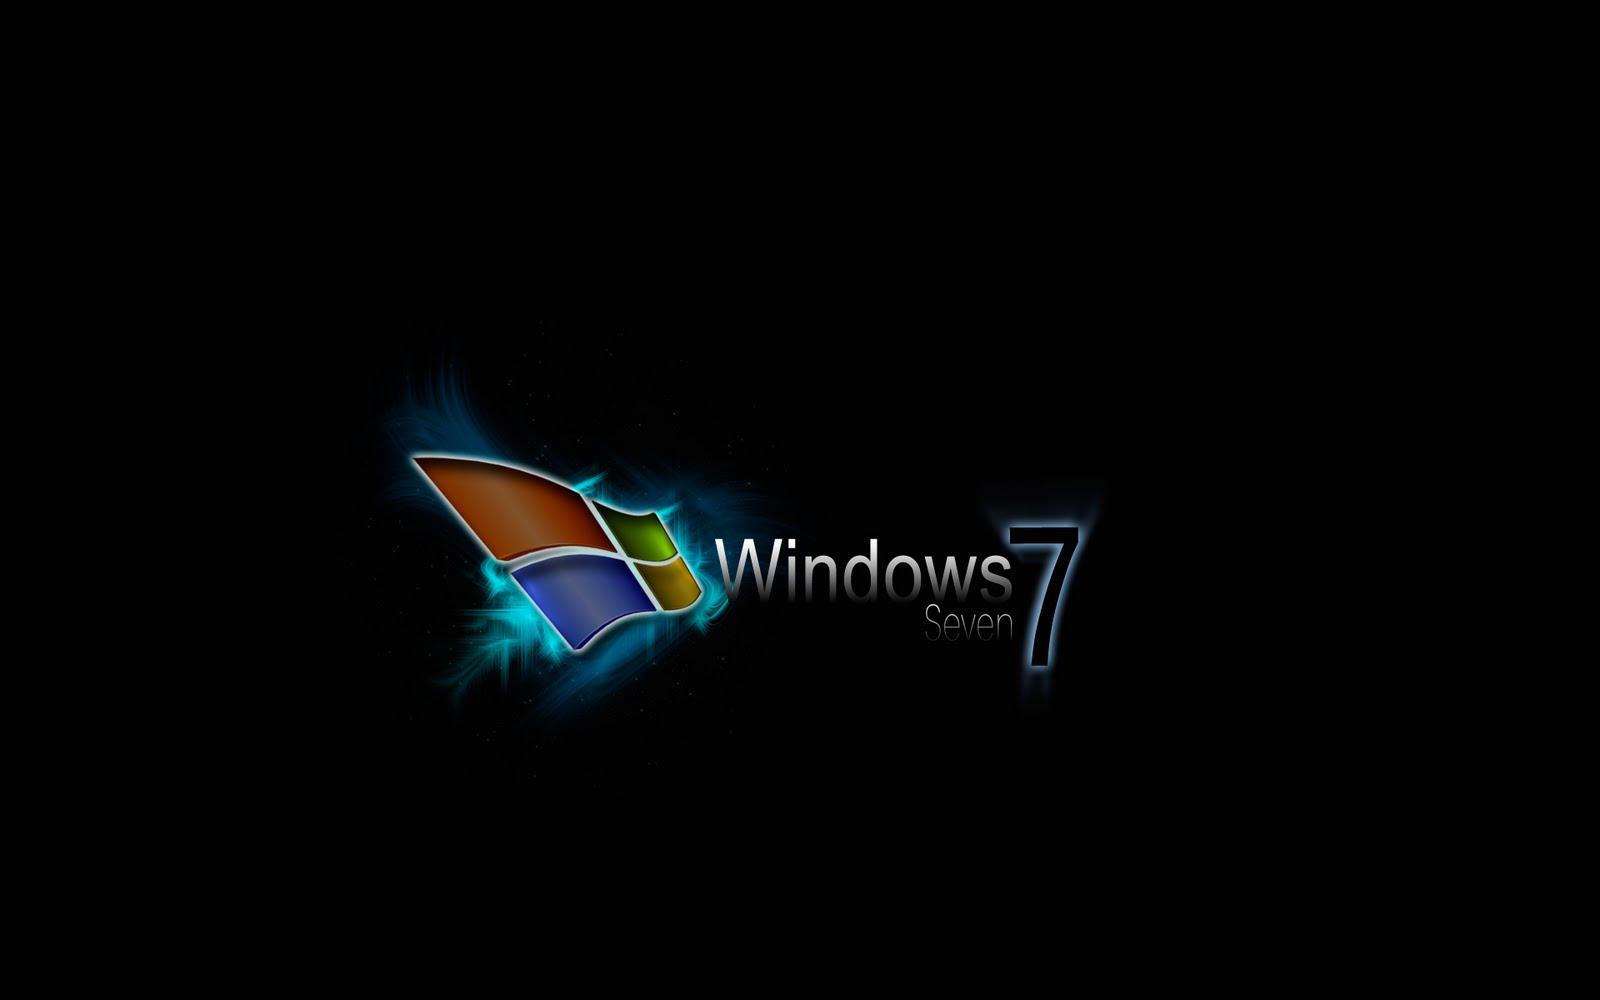 http://3.bp.blogspot.com/_-qVCGm089U8/S8uopTJIKaI/AAAAAAAAArc/s-s-JOEvaQ0/s1600/Nice-Windows-7.jpg